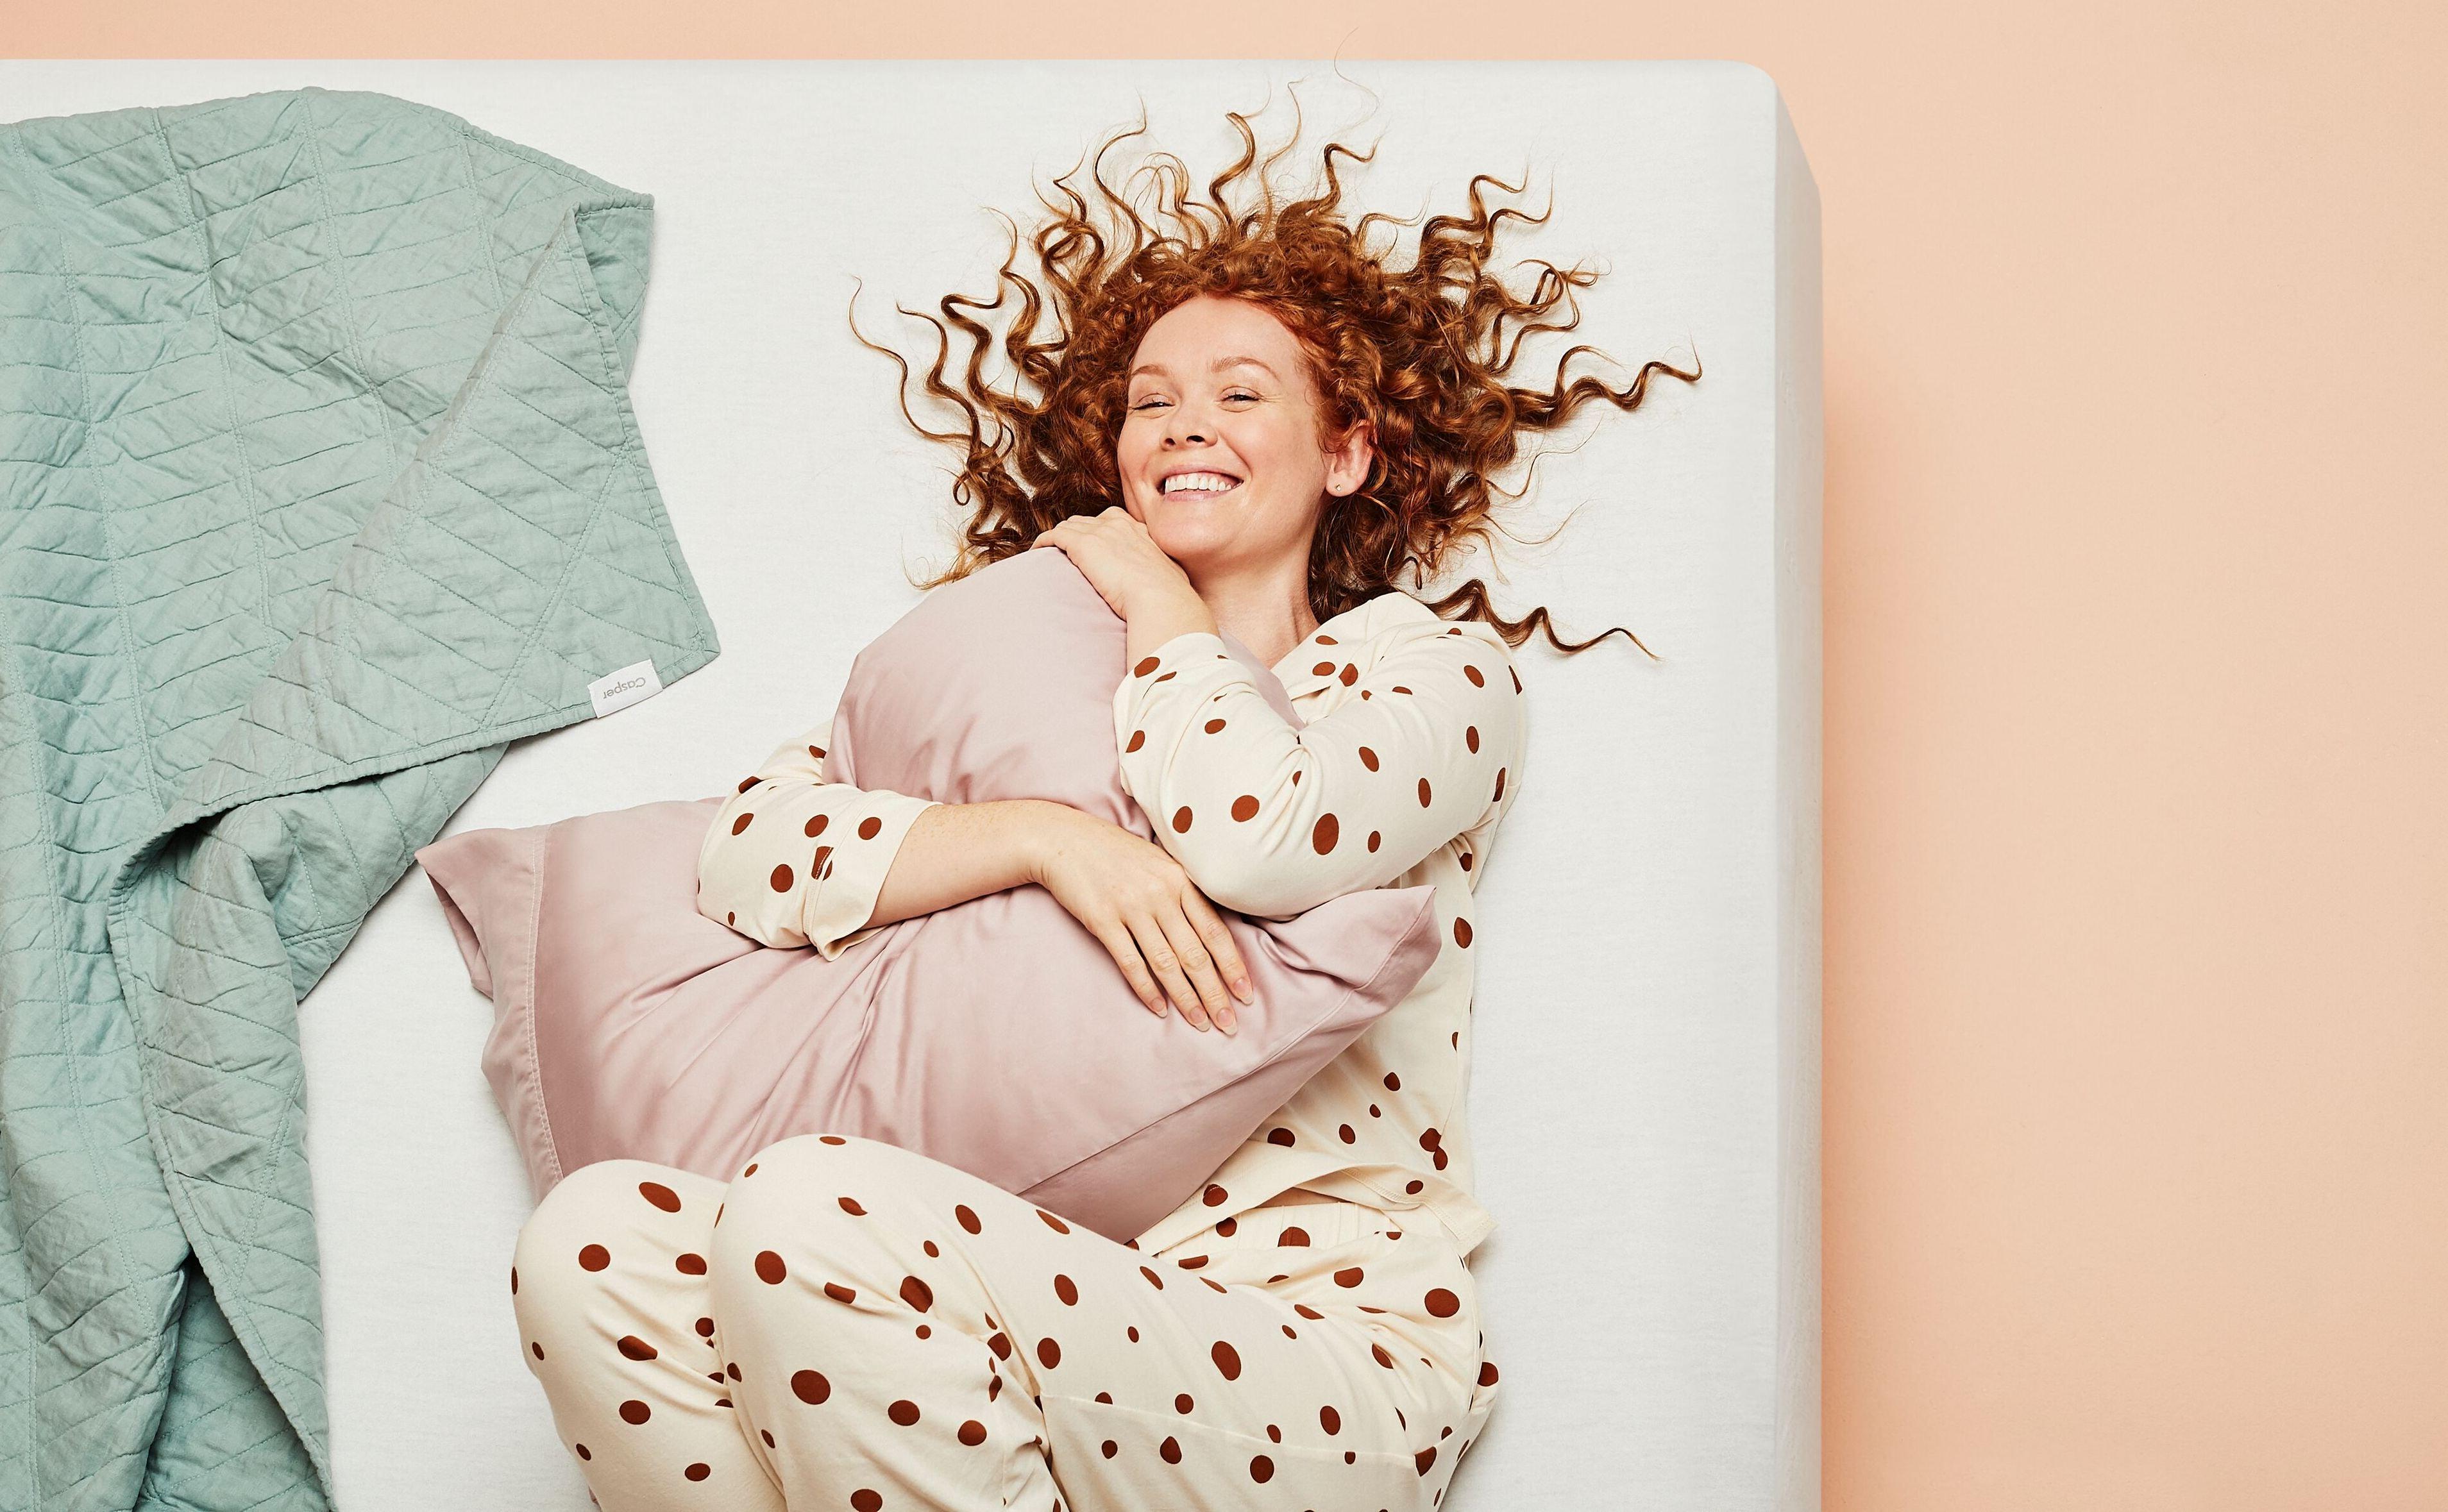 Girl hugging pillow and laughing on her Casper mattress